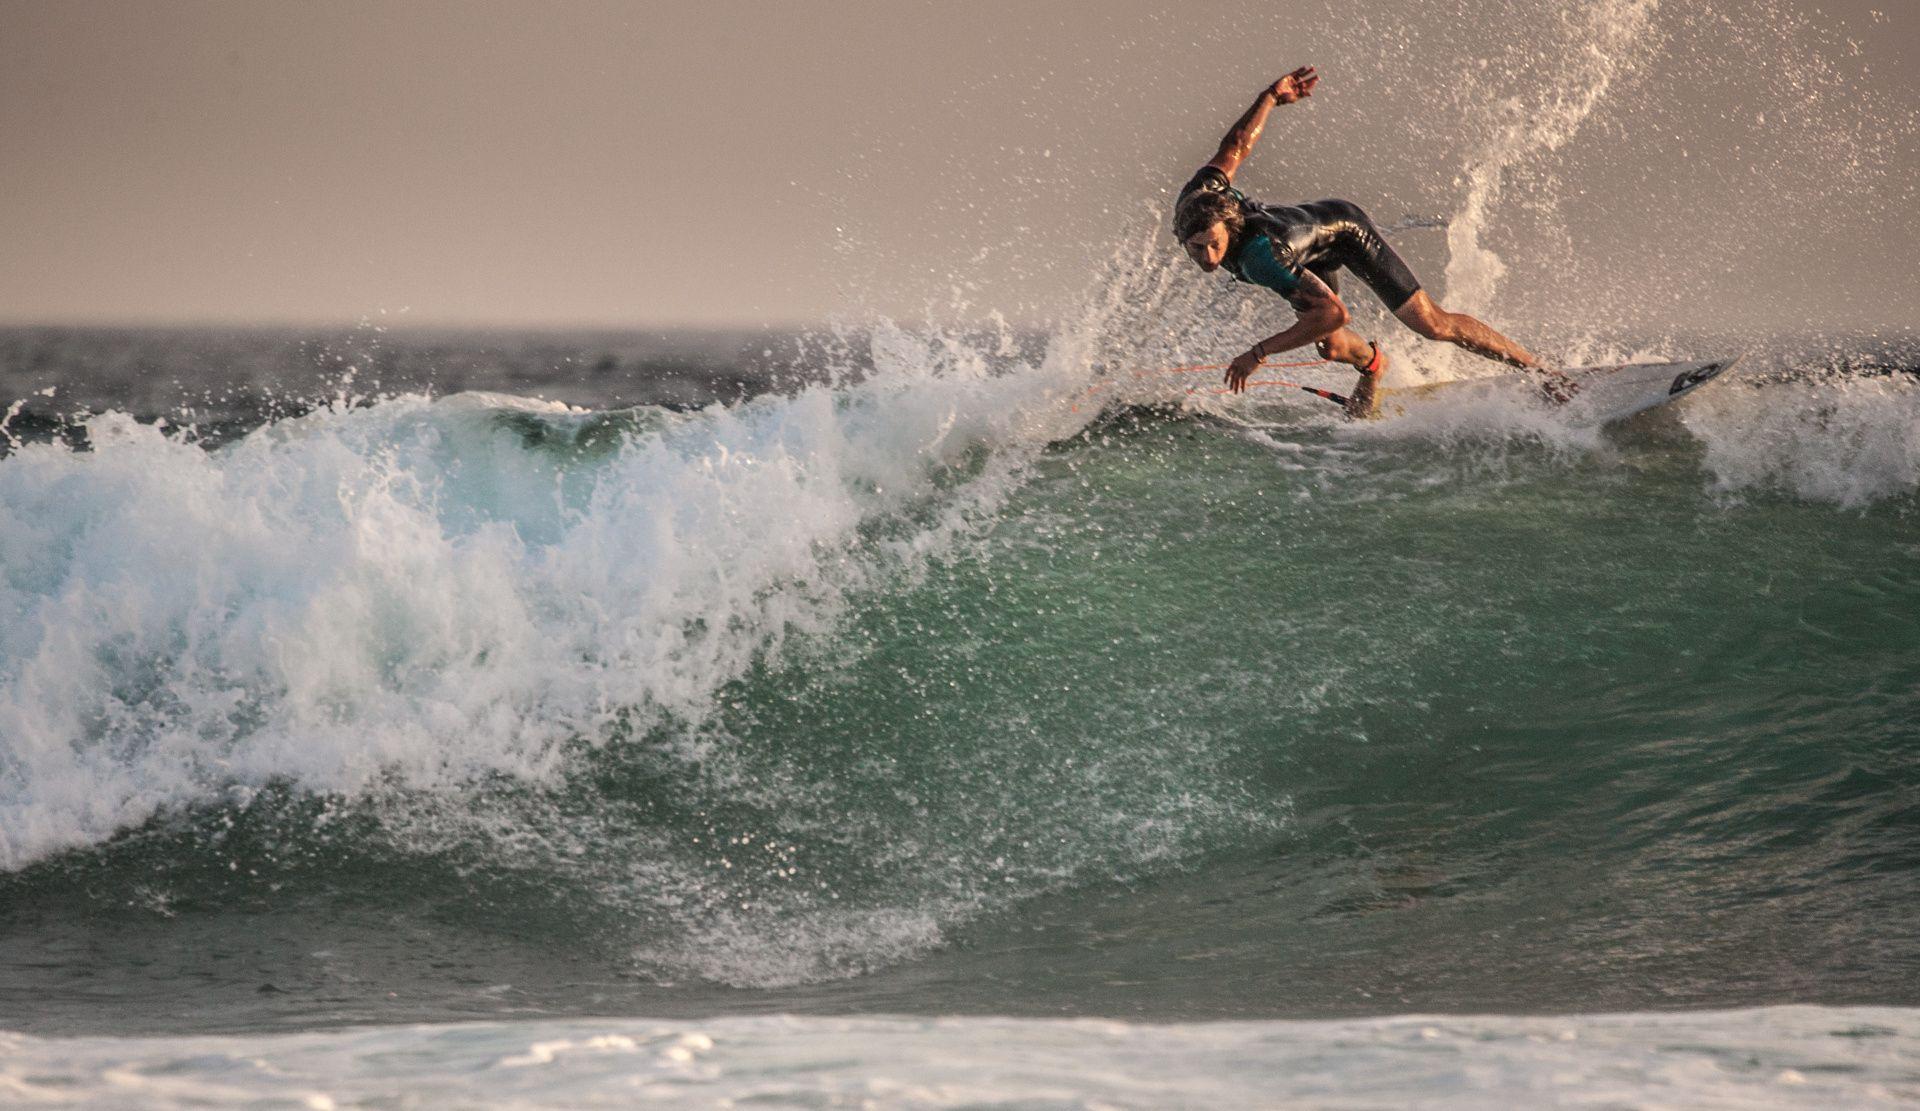 Tenerife surfing - Lovely evening in Las Americas, Tenerife